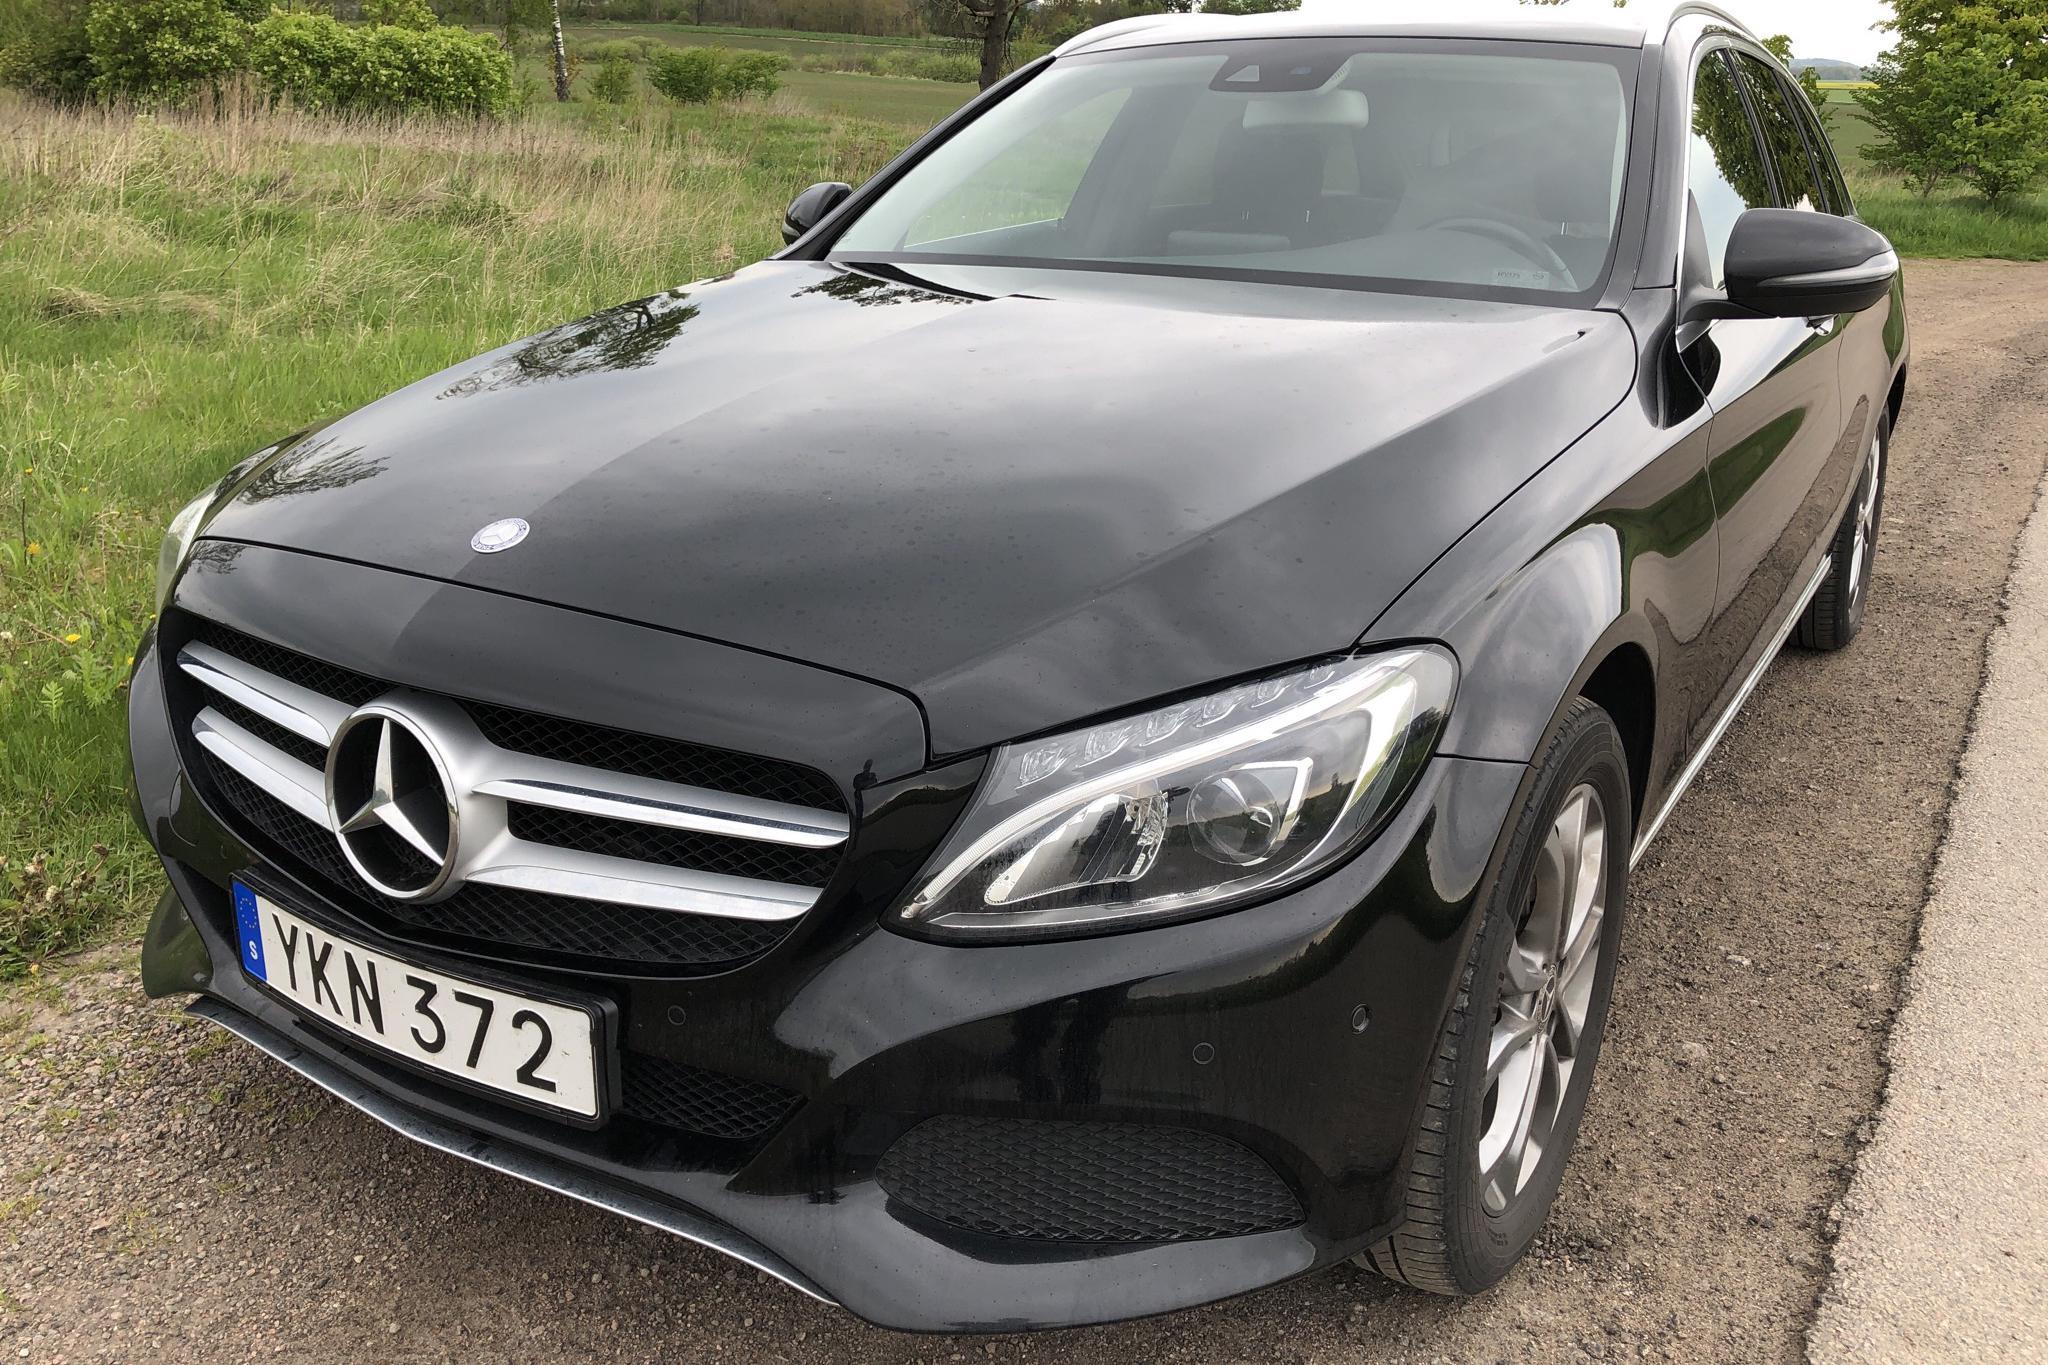 Mercedes C 220 d 4MATIC Kombi S205 (170hk) - 102 370 km - Automatic - black - 2017